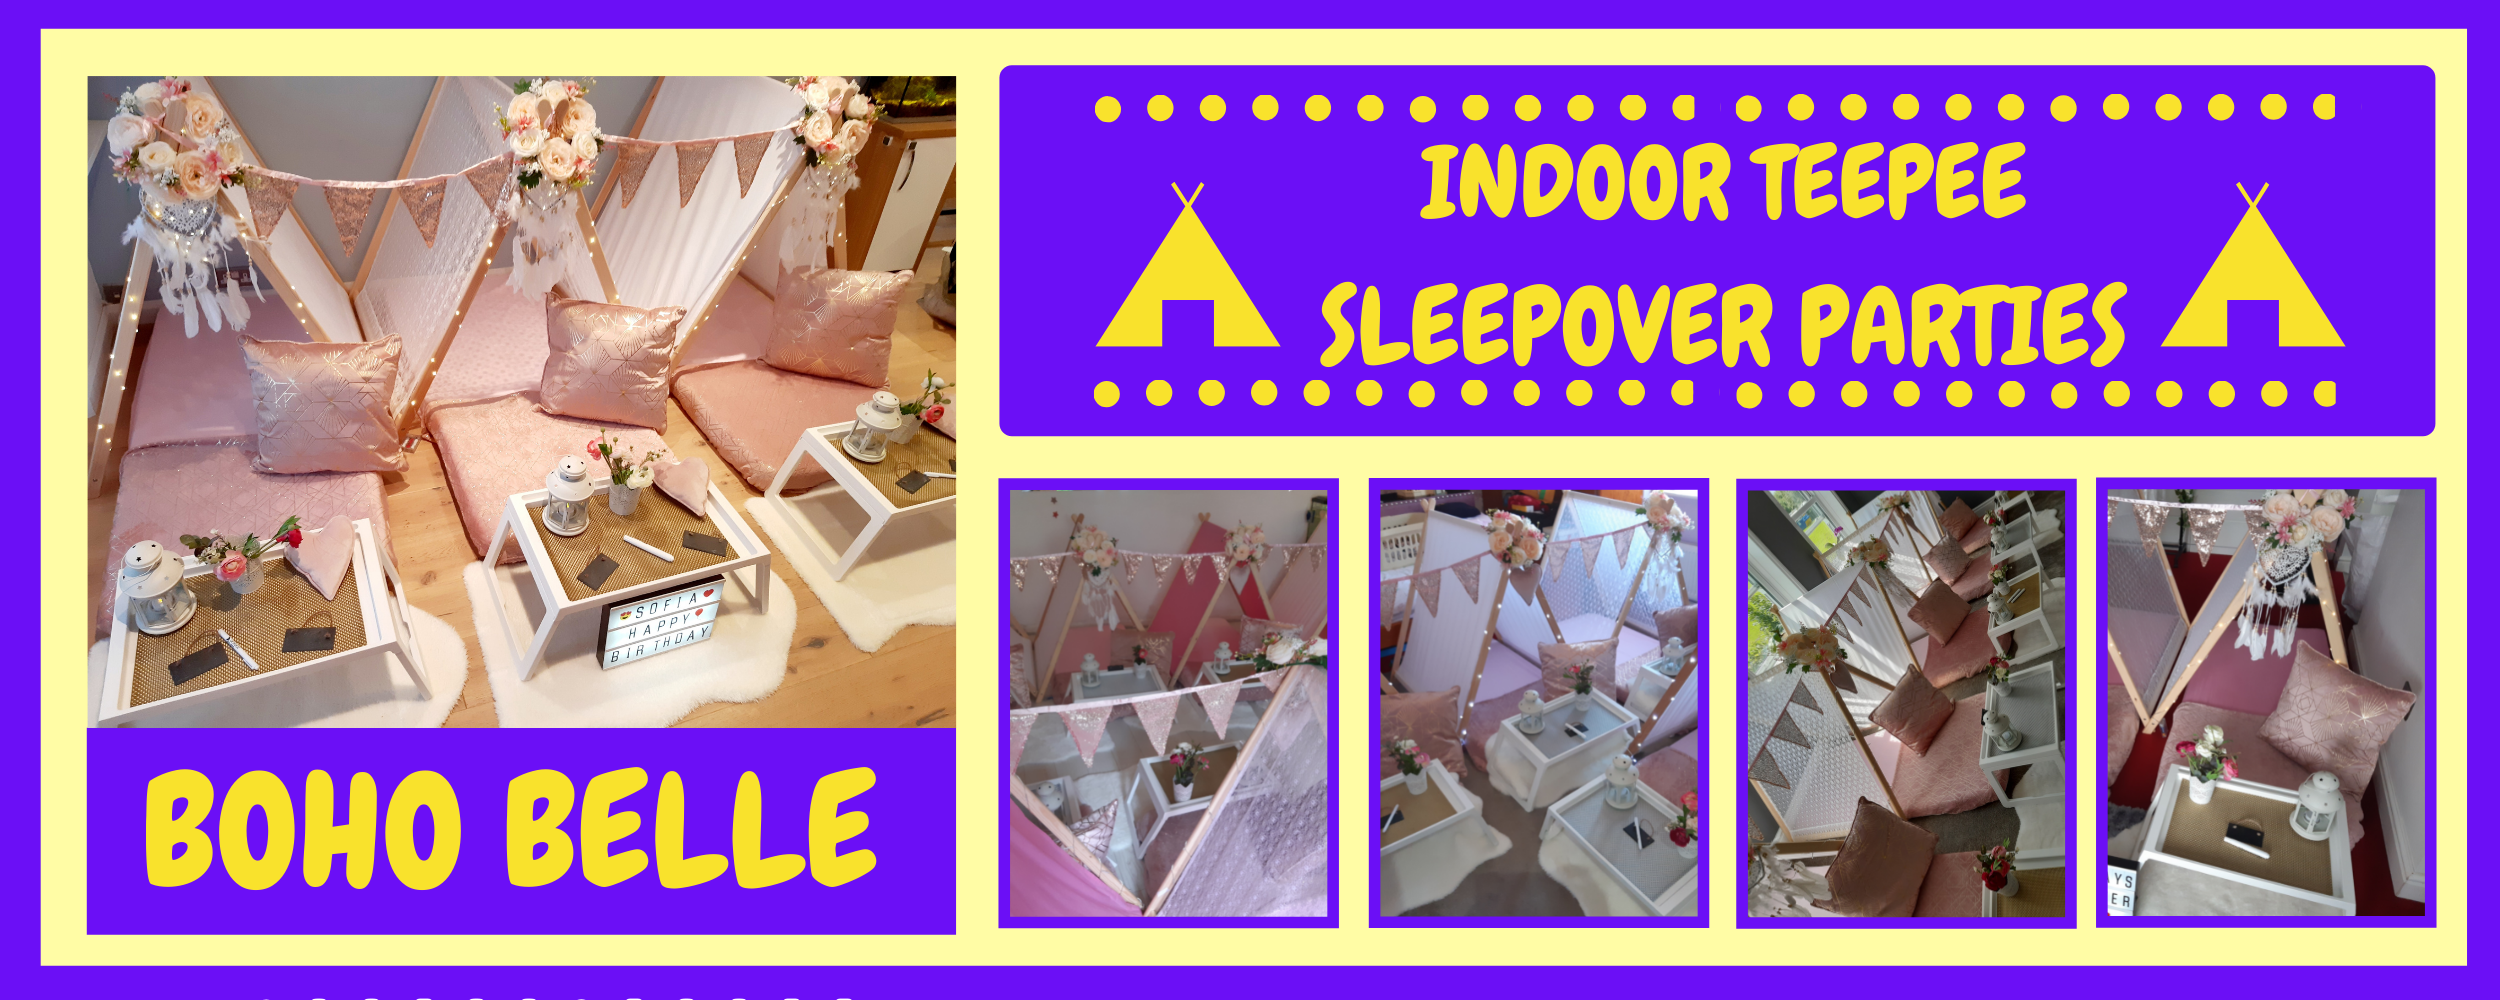 sleepover-party-teepee-tent-hire